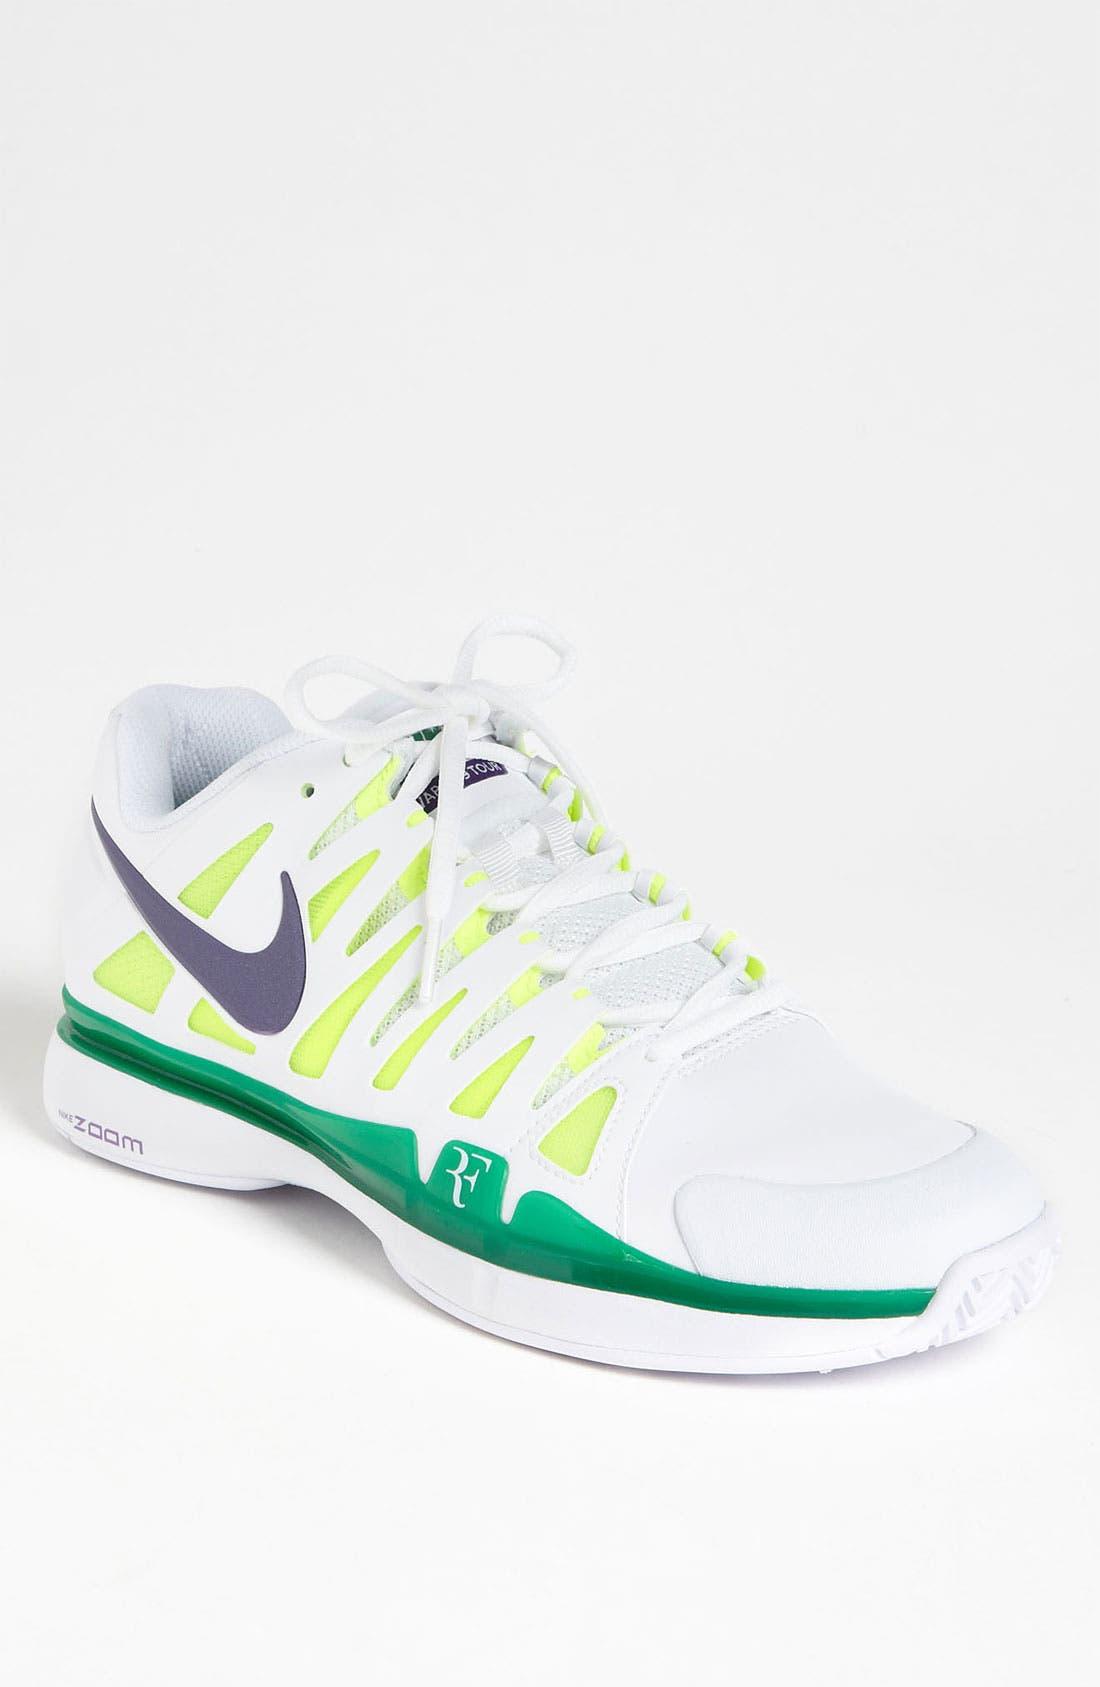 Main Image - Nike 'Zoom Vapor 9 Tour SL' Tennis Shoe (Men)